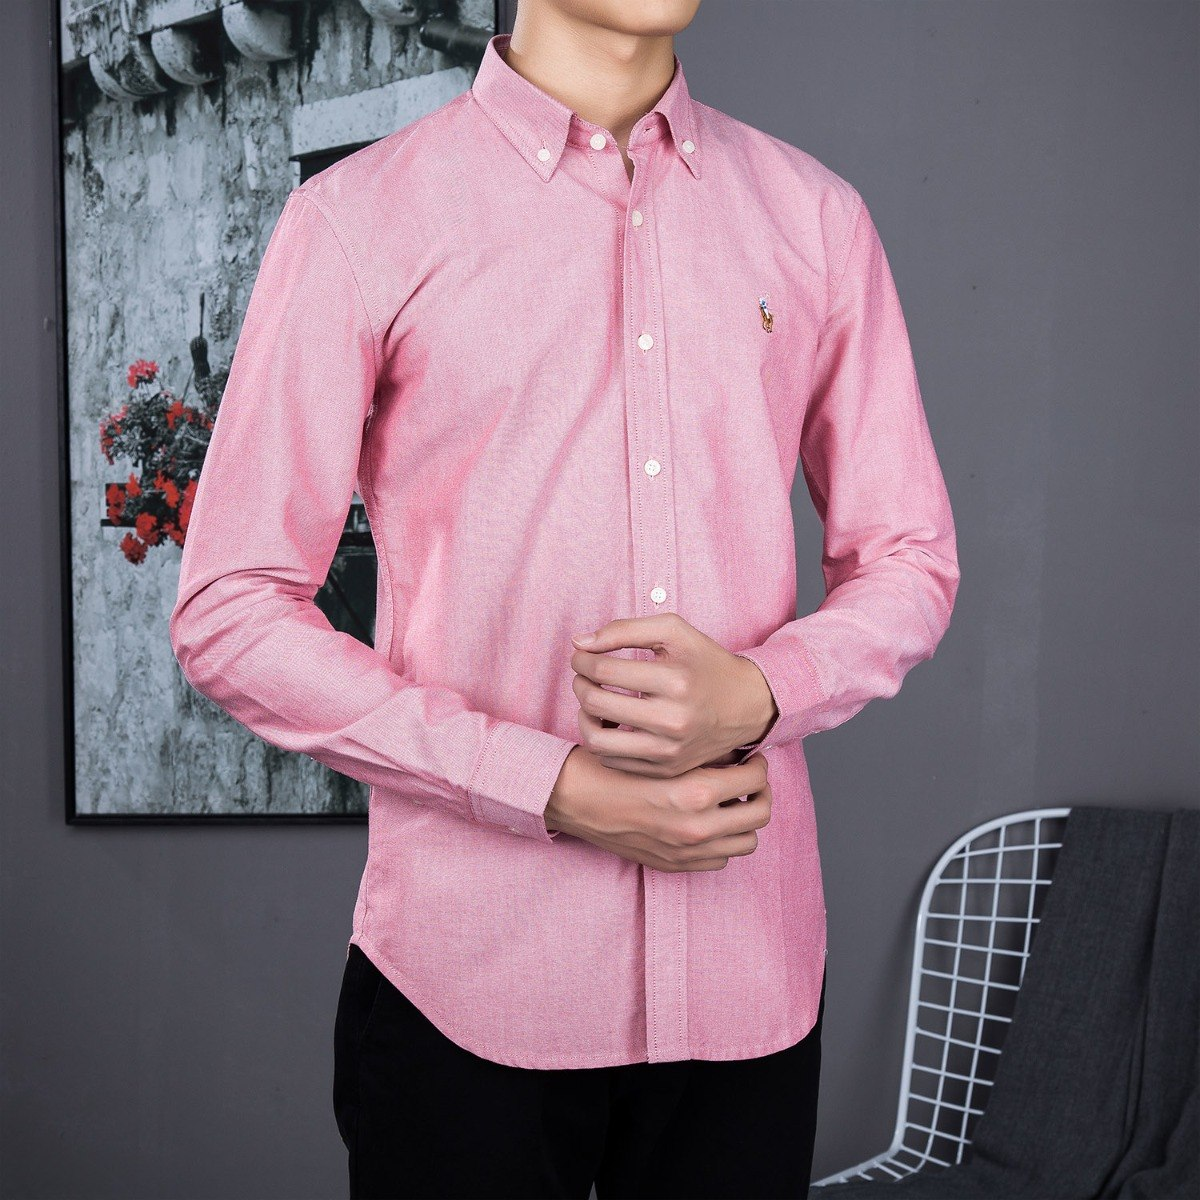 camisa polo ralph lauren masculina vermelha pronta entrega. Carregando zoom. 46ec78ed5bc